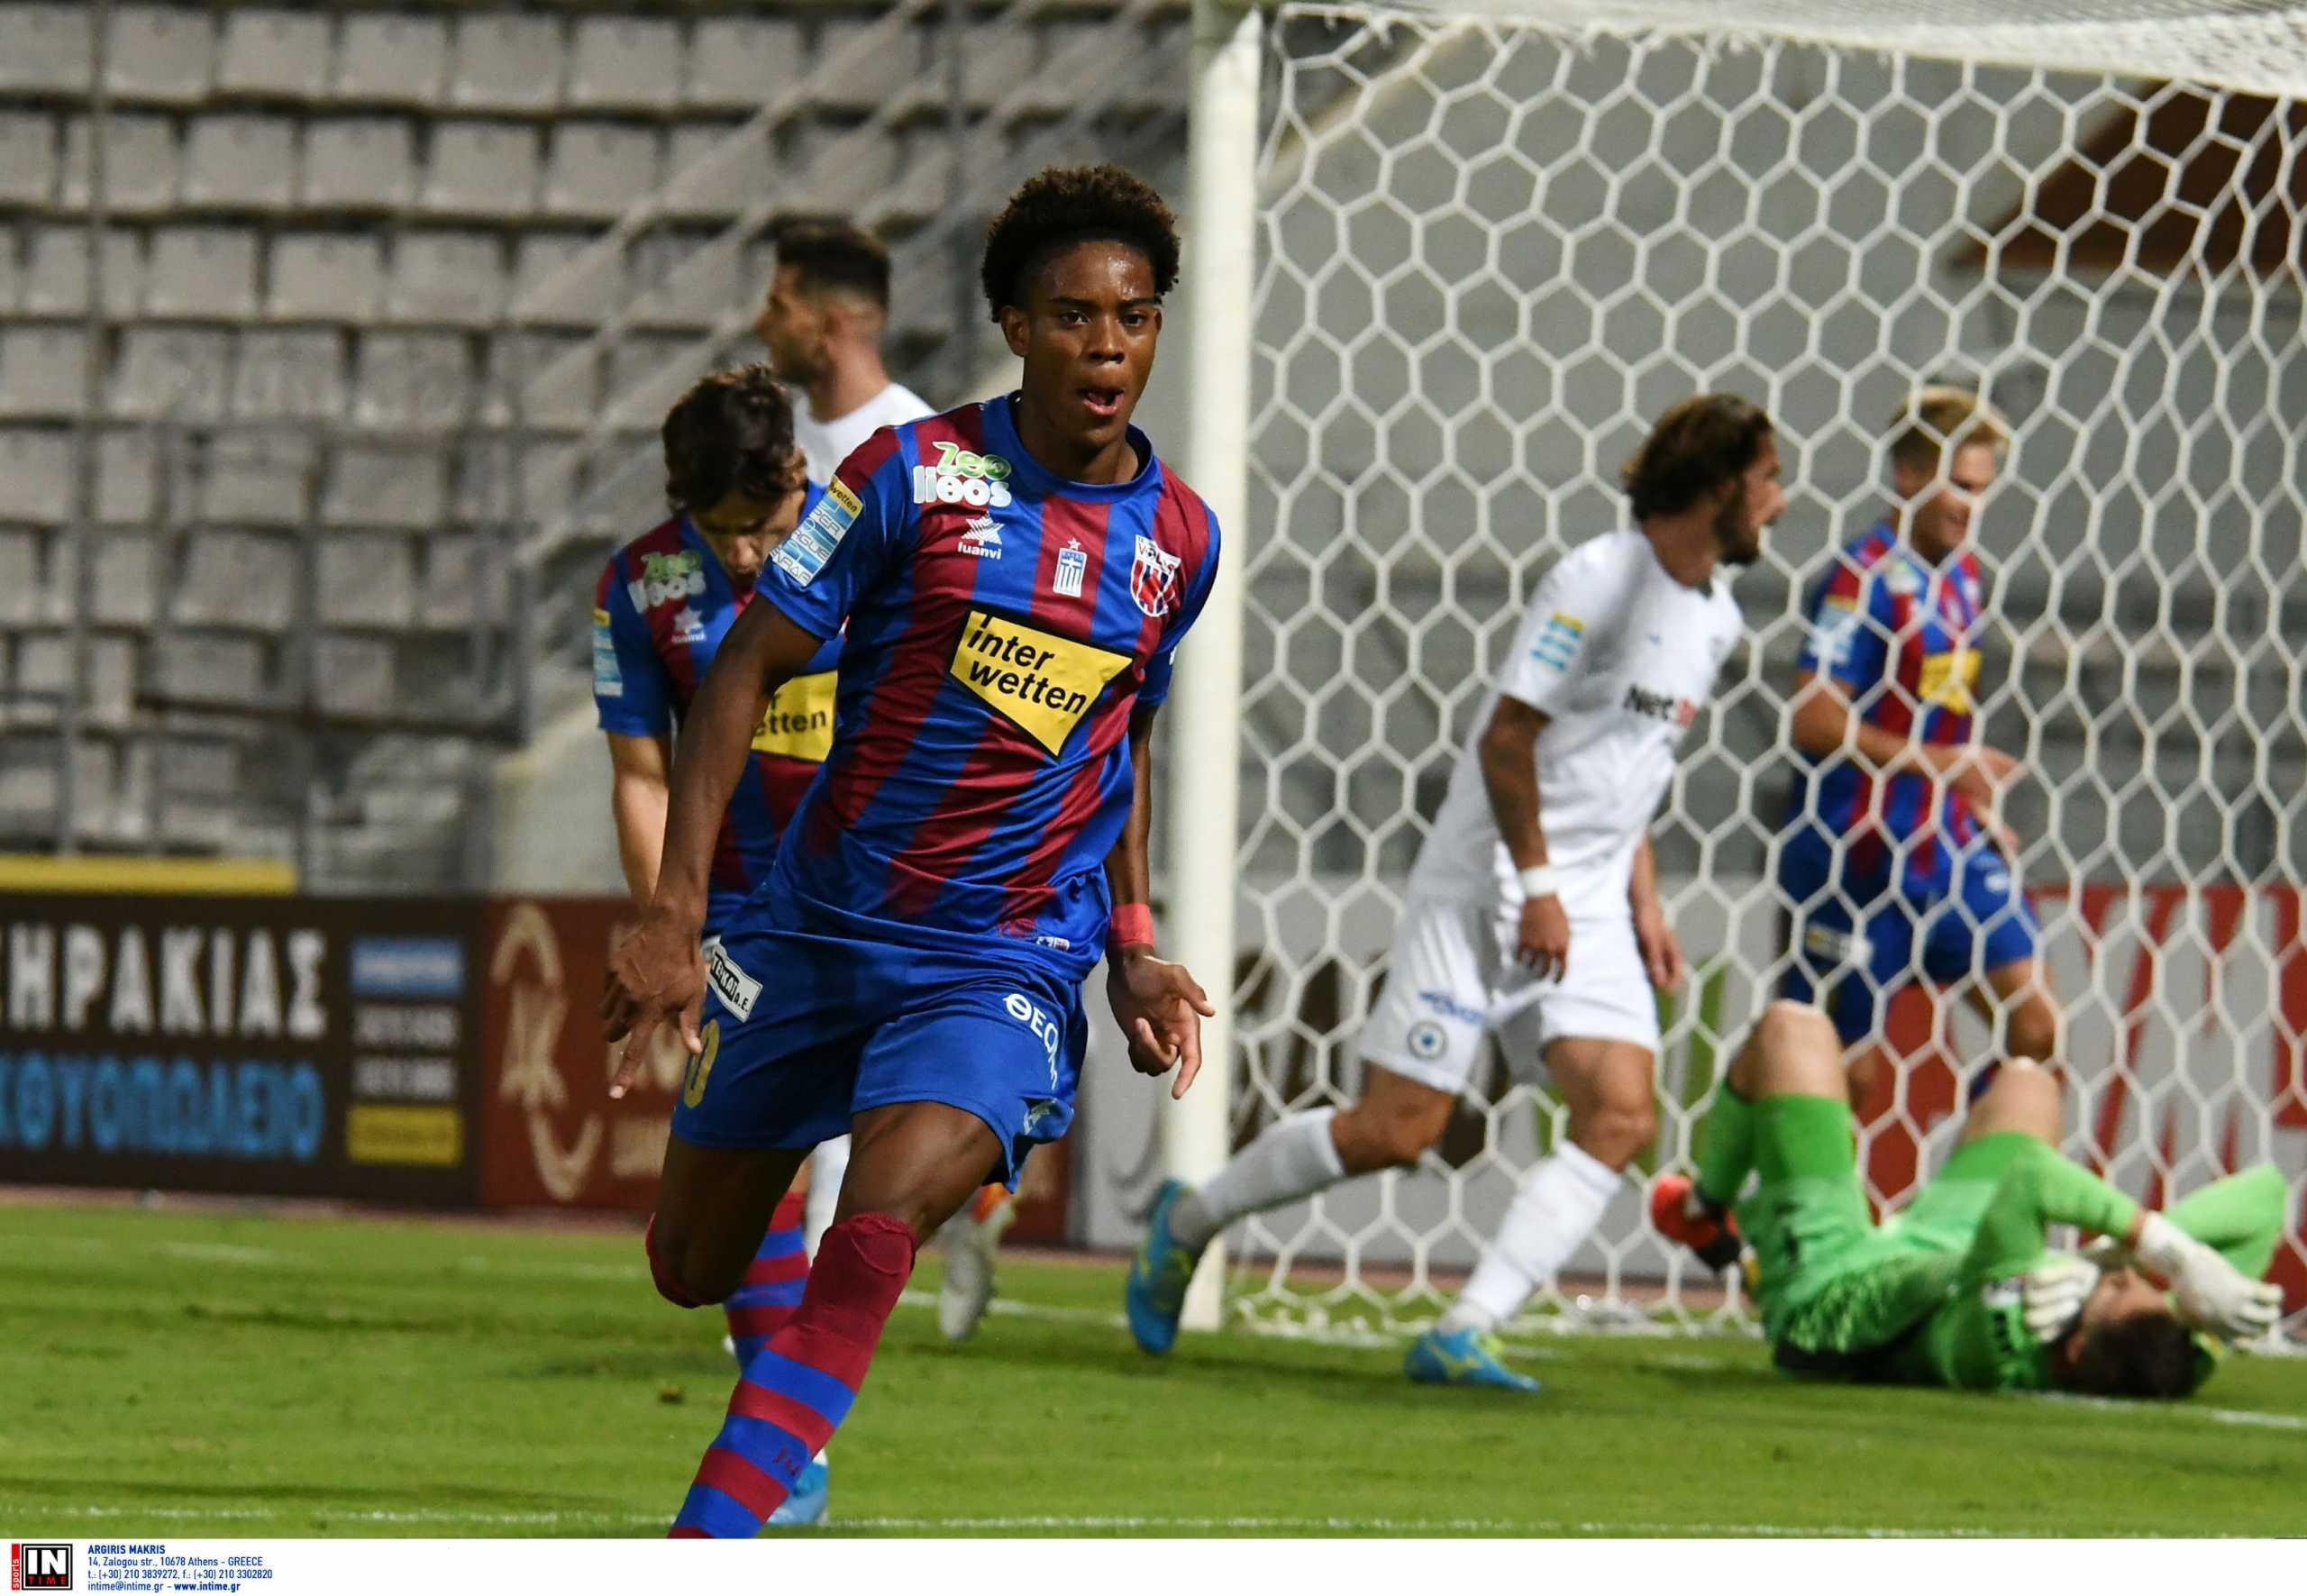 Super League 1, Βόλος – Ατρόμητος 3-0: Ασταμάτητοι και πρωτοπόροι οι Θεσσαλοί